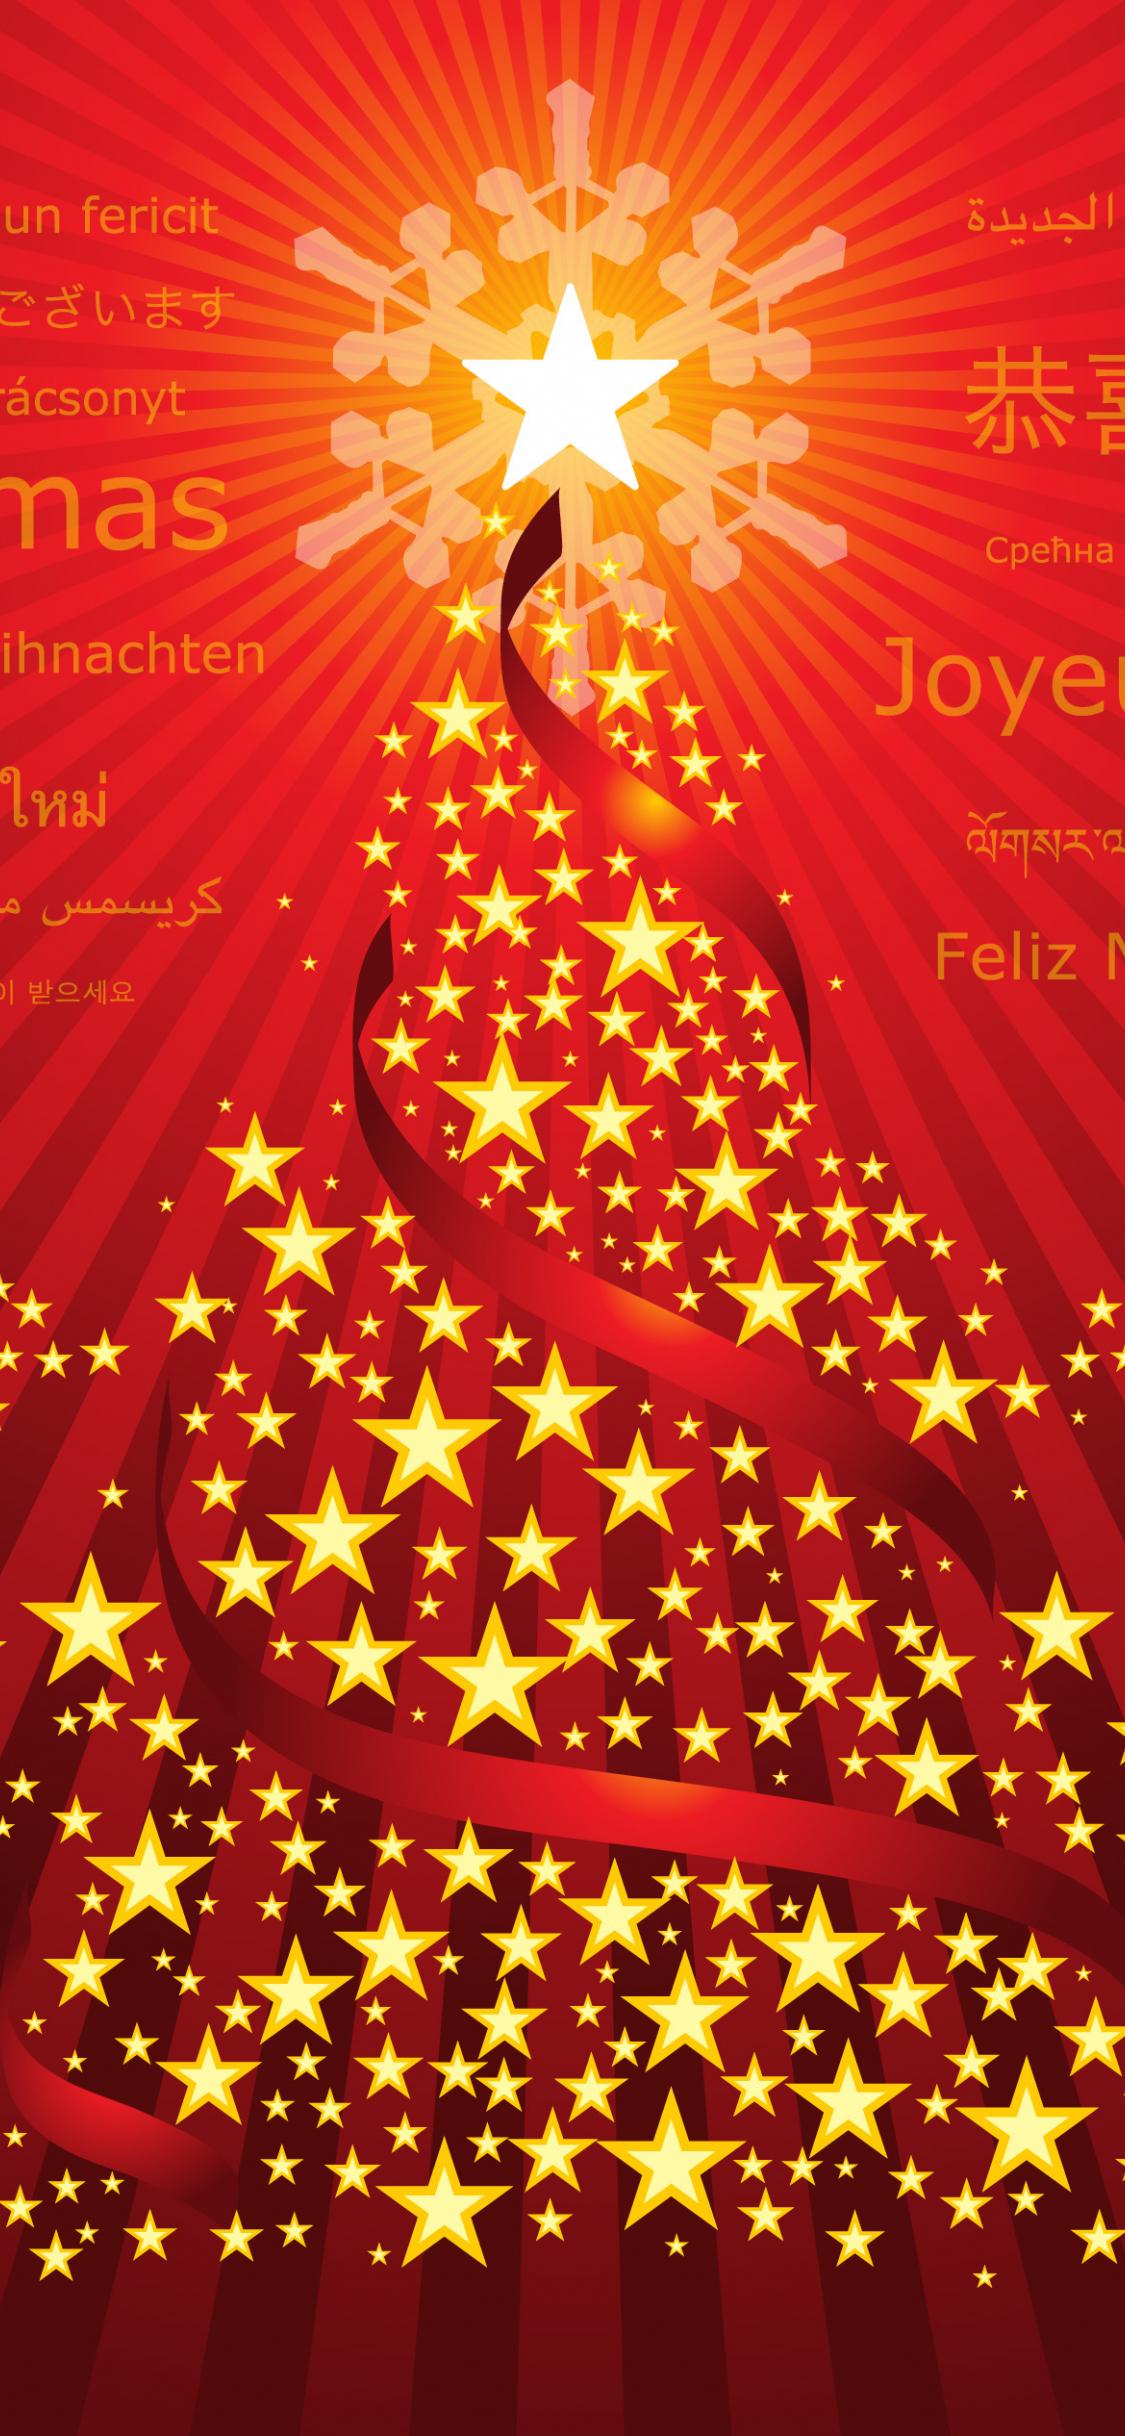 Free Download Christmas Wallpapers Desktop Backgrounds